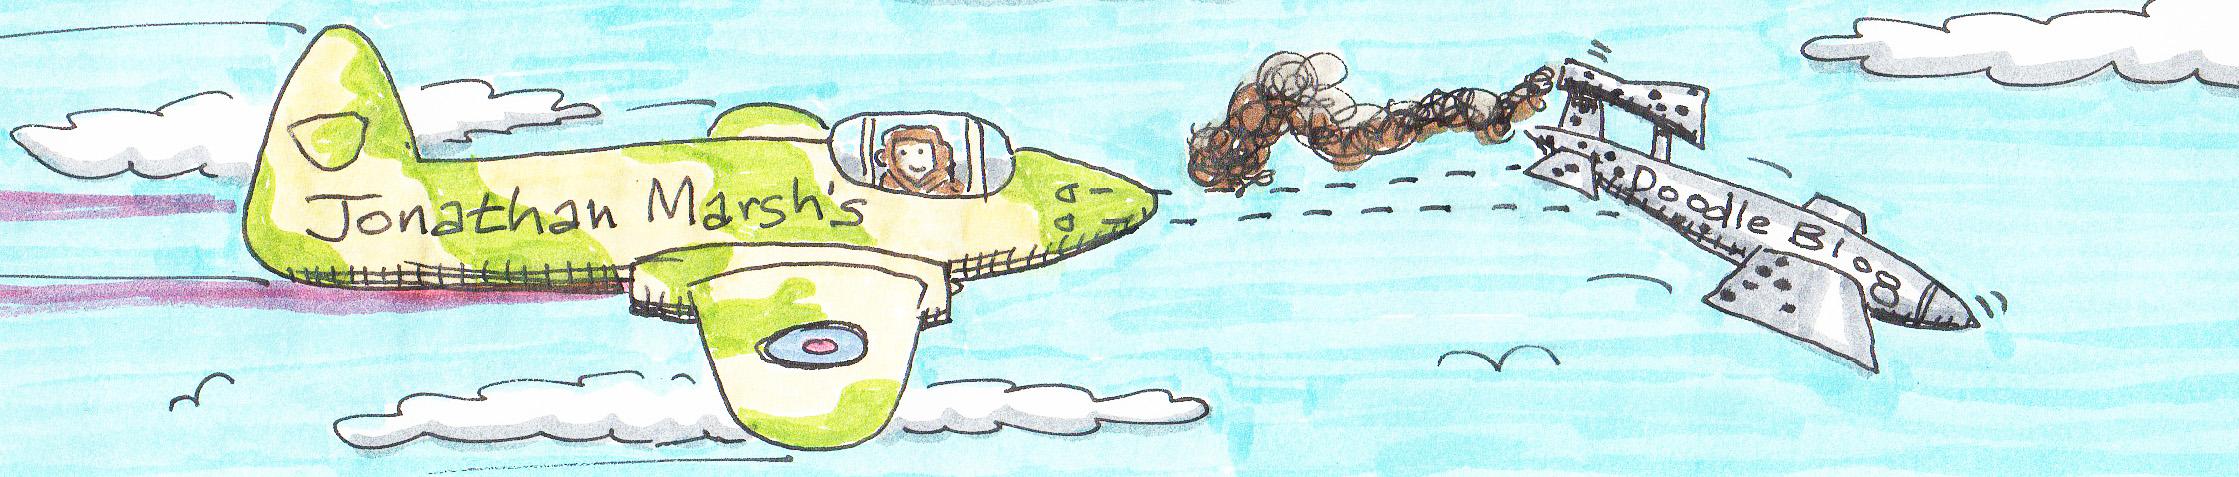 Jonathan Marsh's DoodleBlog